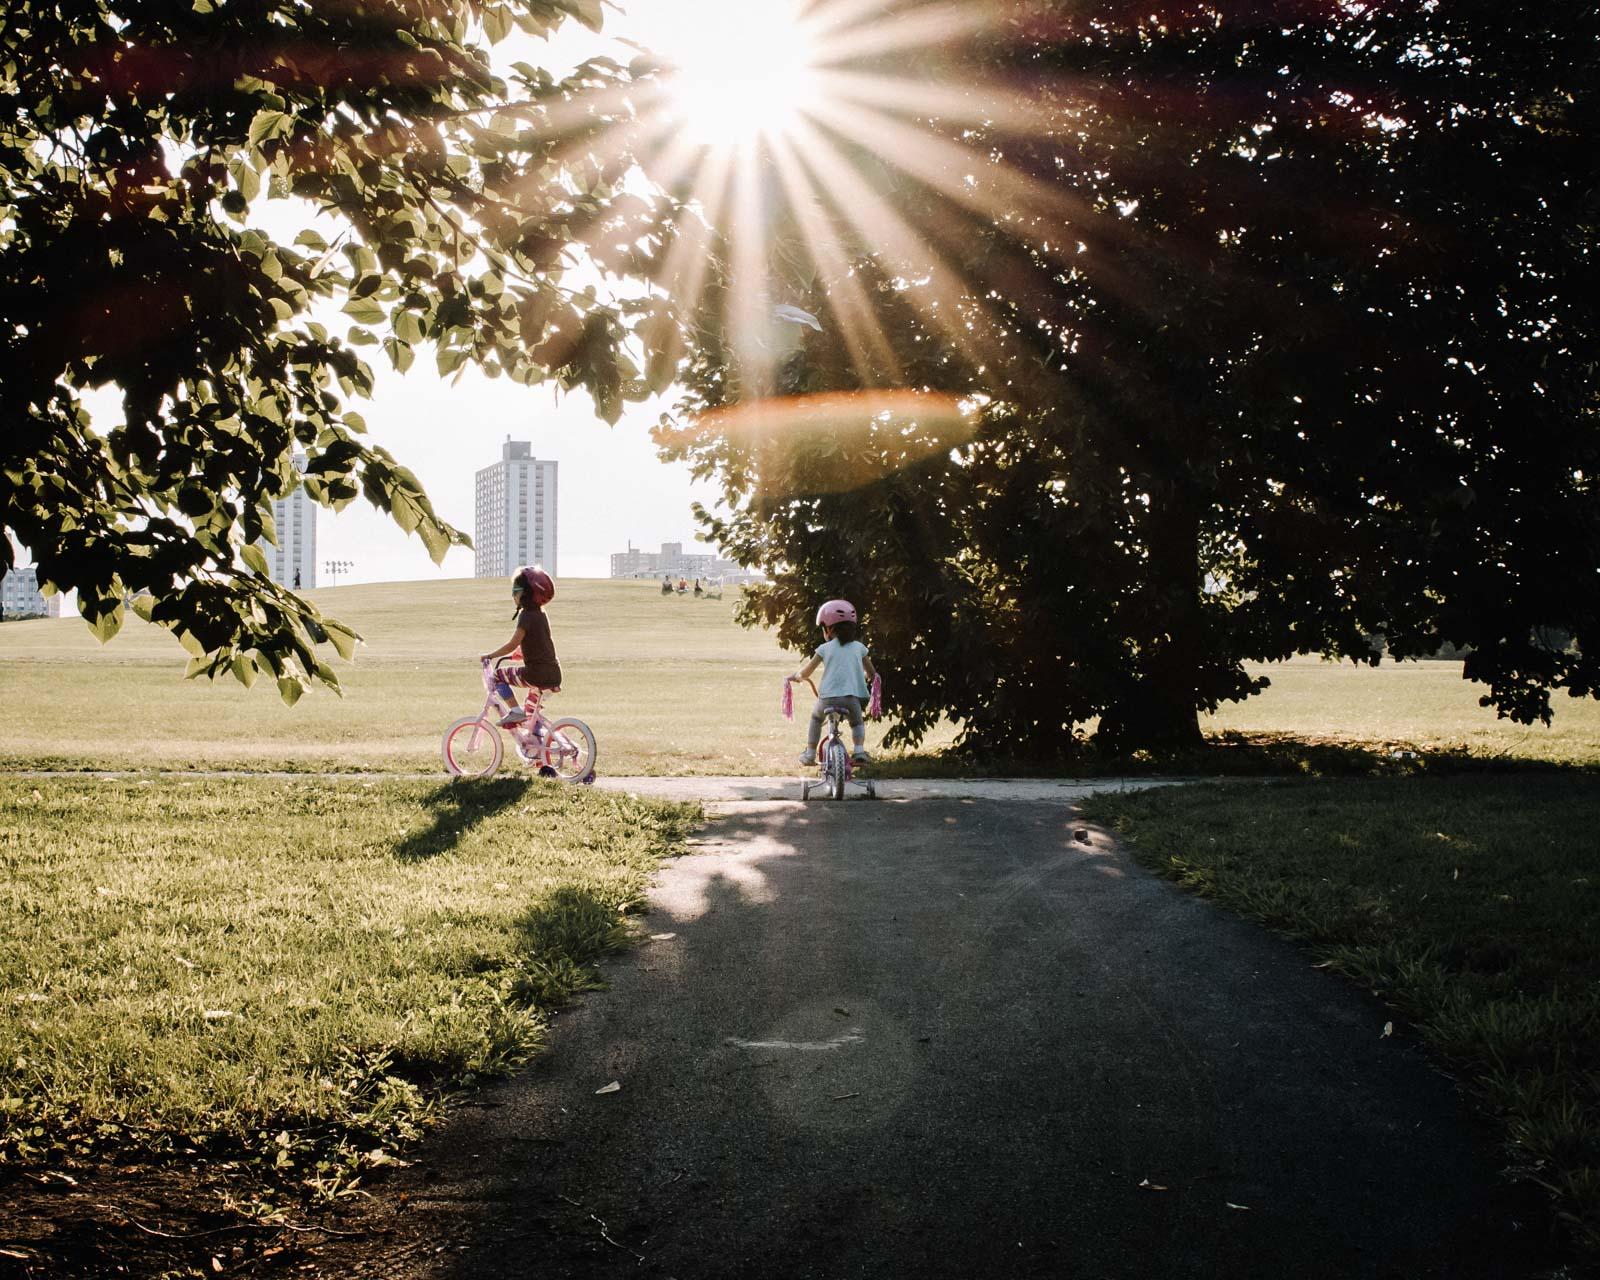 bike ride at sunset. Alicia Mayorca Photography | Chicago Couple + Maternity + Family Photographer.jpg